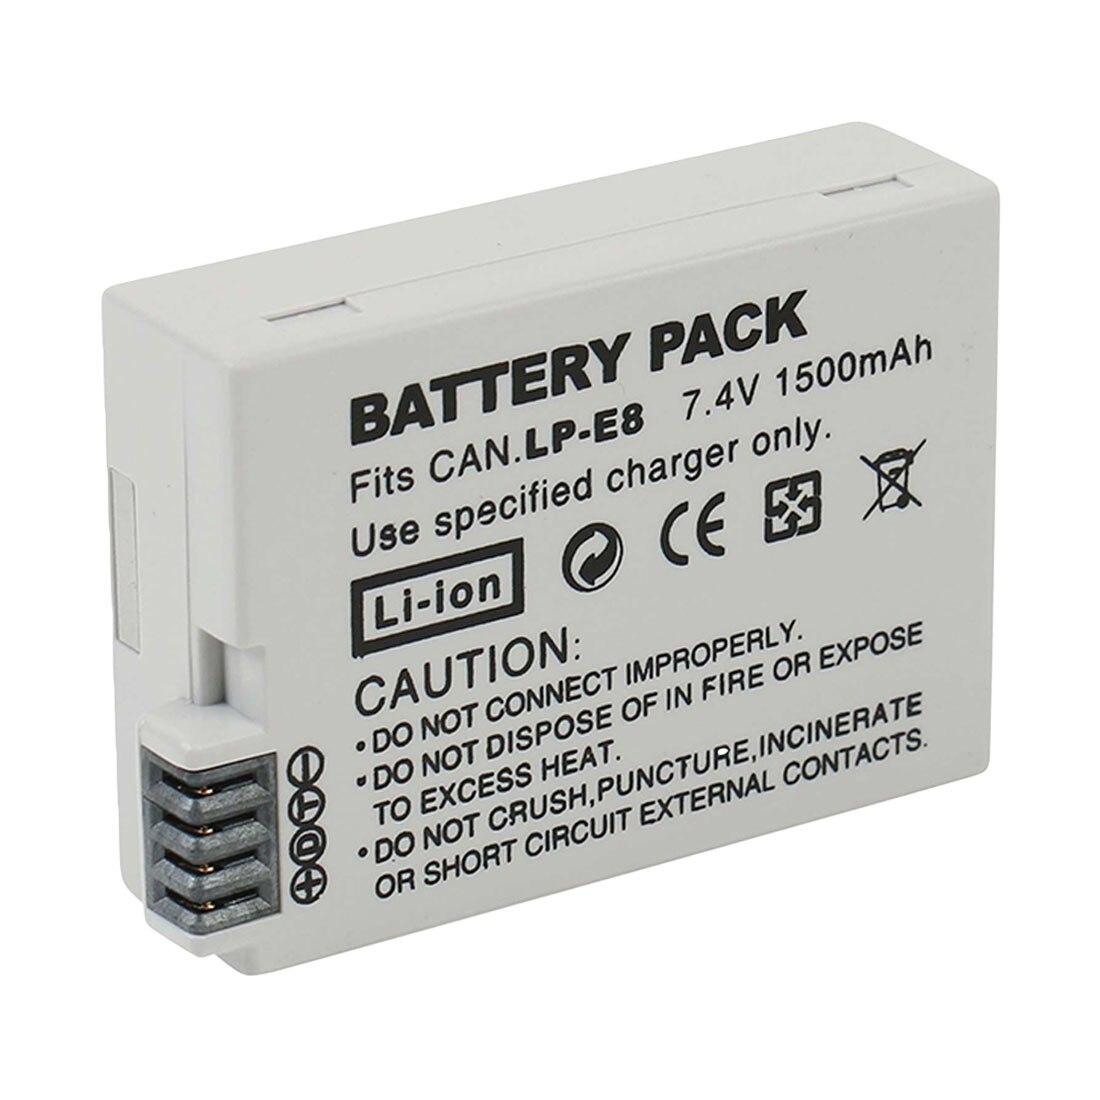 High Quality LP-E8 Battery Pack Bateria LP-E8 Lp E8 For Canon 550D 600D 650D 700D X4 X5 X6i X7i T2i T3i T4i T5i DSLR Camera 0.11High Quality LP-E8 Battery Pack Bateria LP-E8 Lp E8 For Canon 550D 600D 650D 700D X4 X5 X6i X7i T2i T3i T4i T5i DSLR Camera 0.11